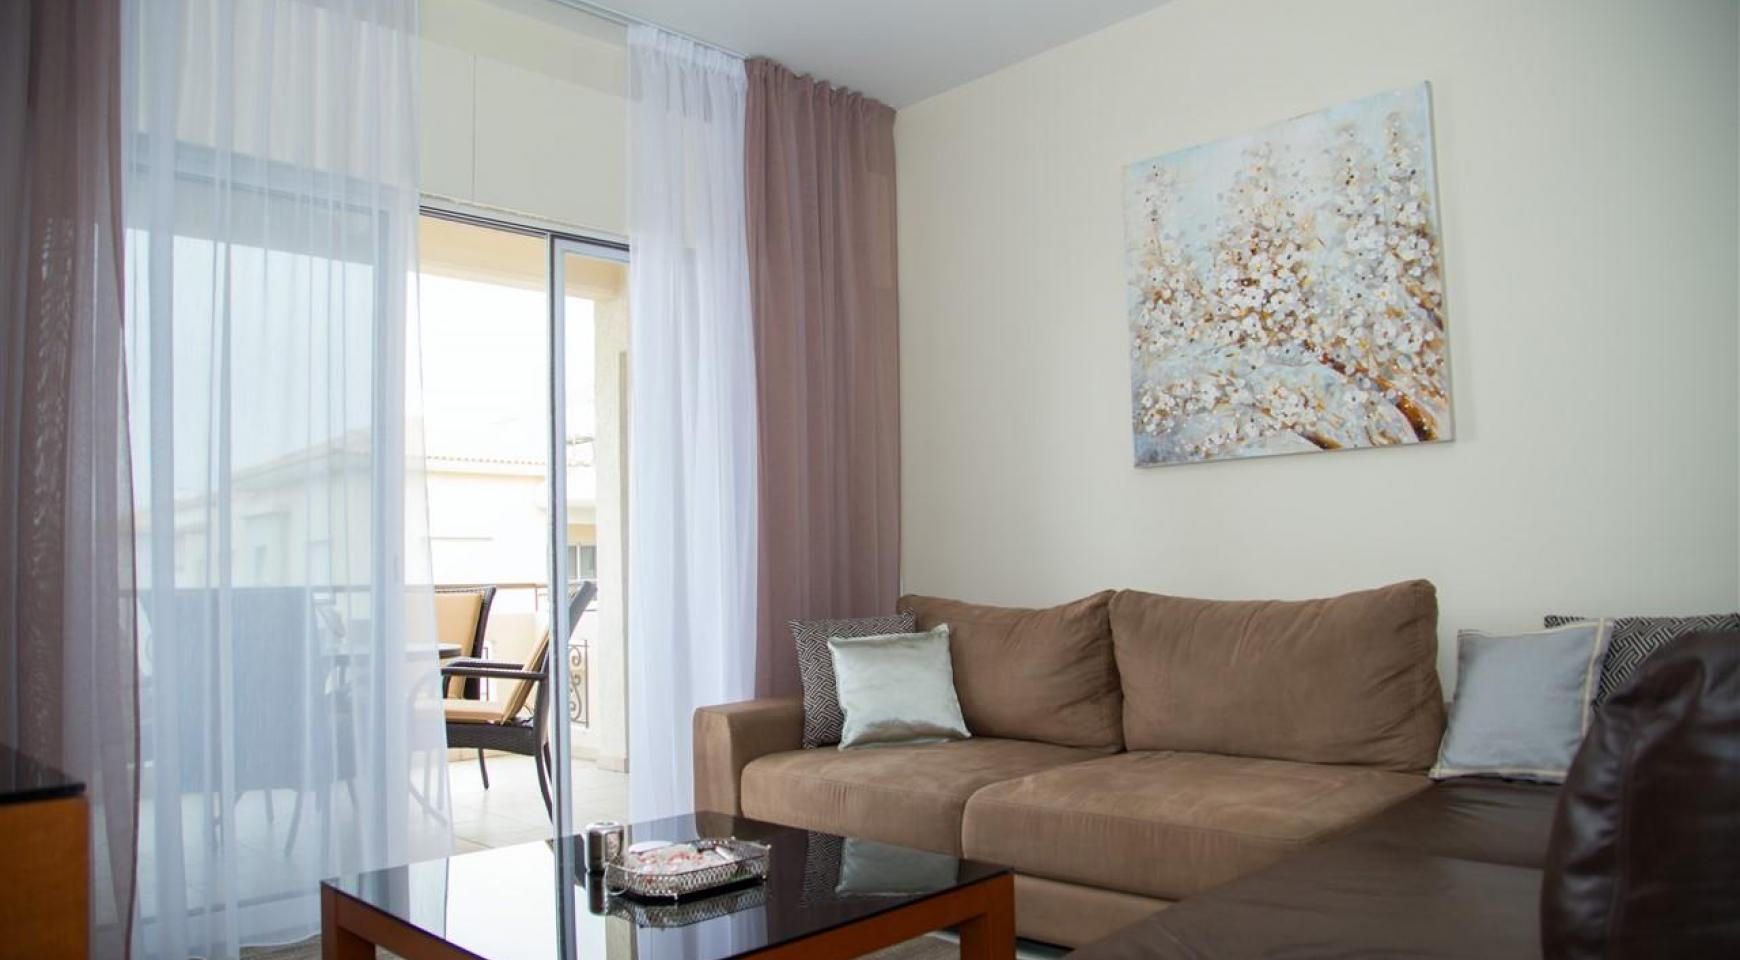 Luxury 2 Bedroom Apartment Mesogios Iris 304 in the Tourist area near the Beach - 3